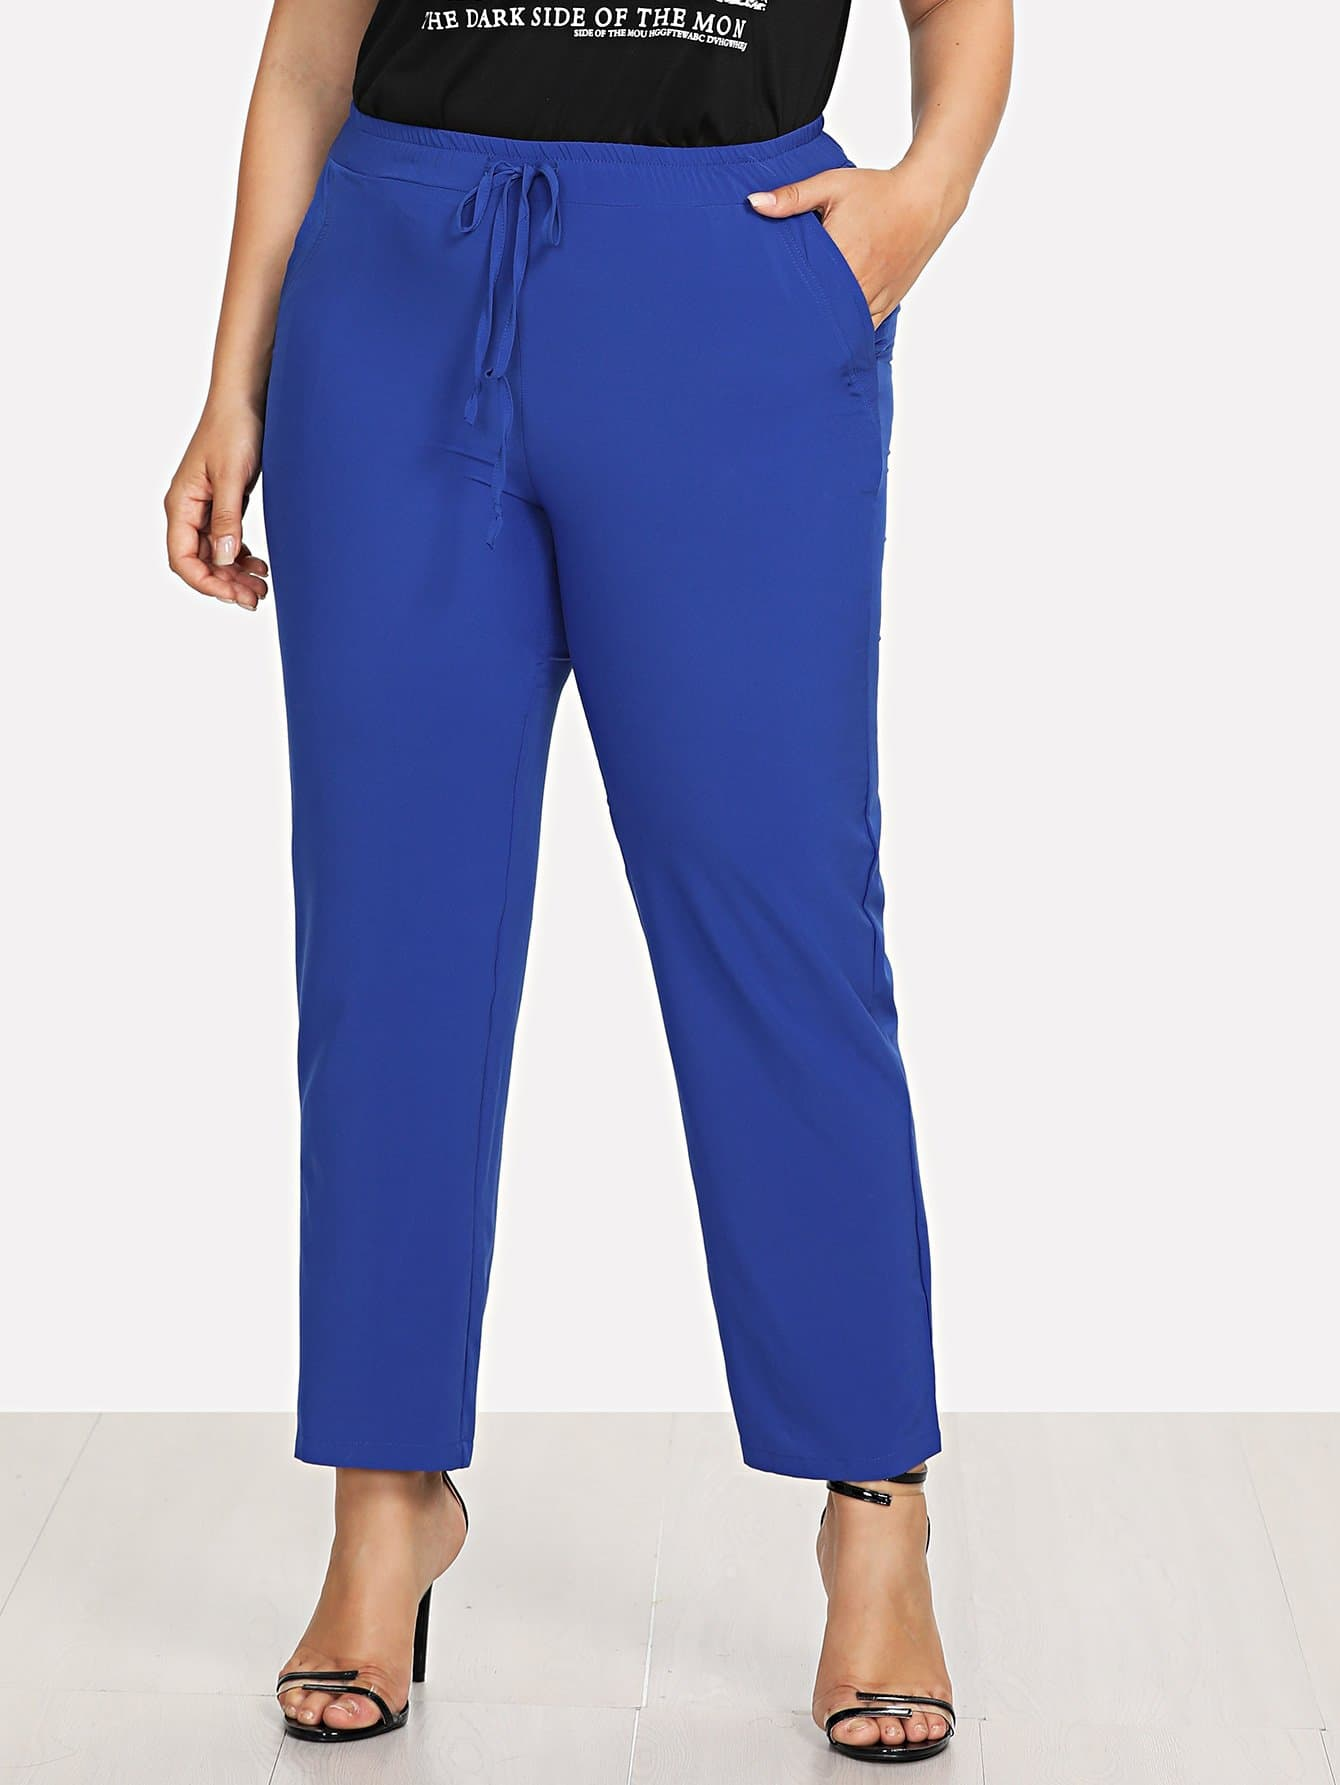 Drawstring Waist Solid Pants plus size ruffle drawstring waist gaucho pants